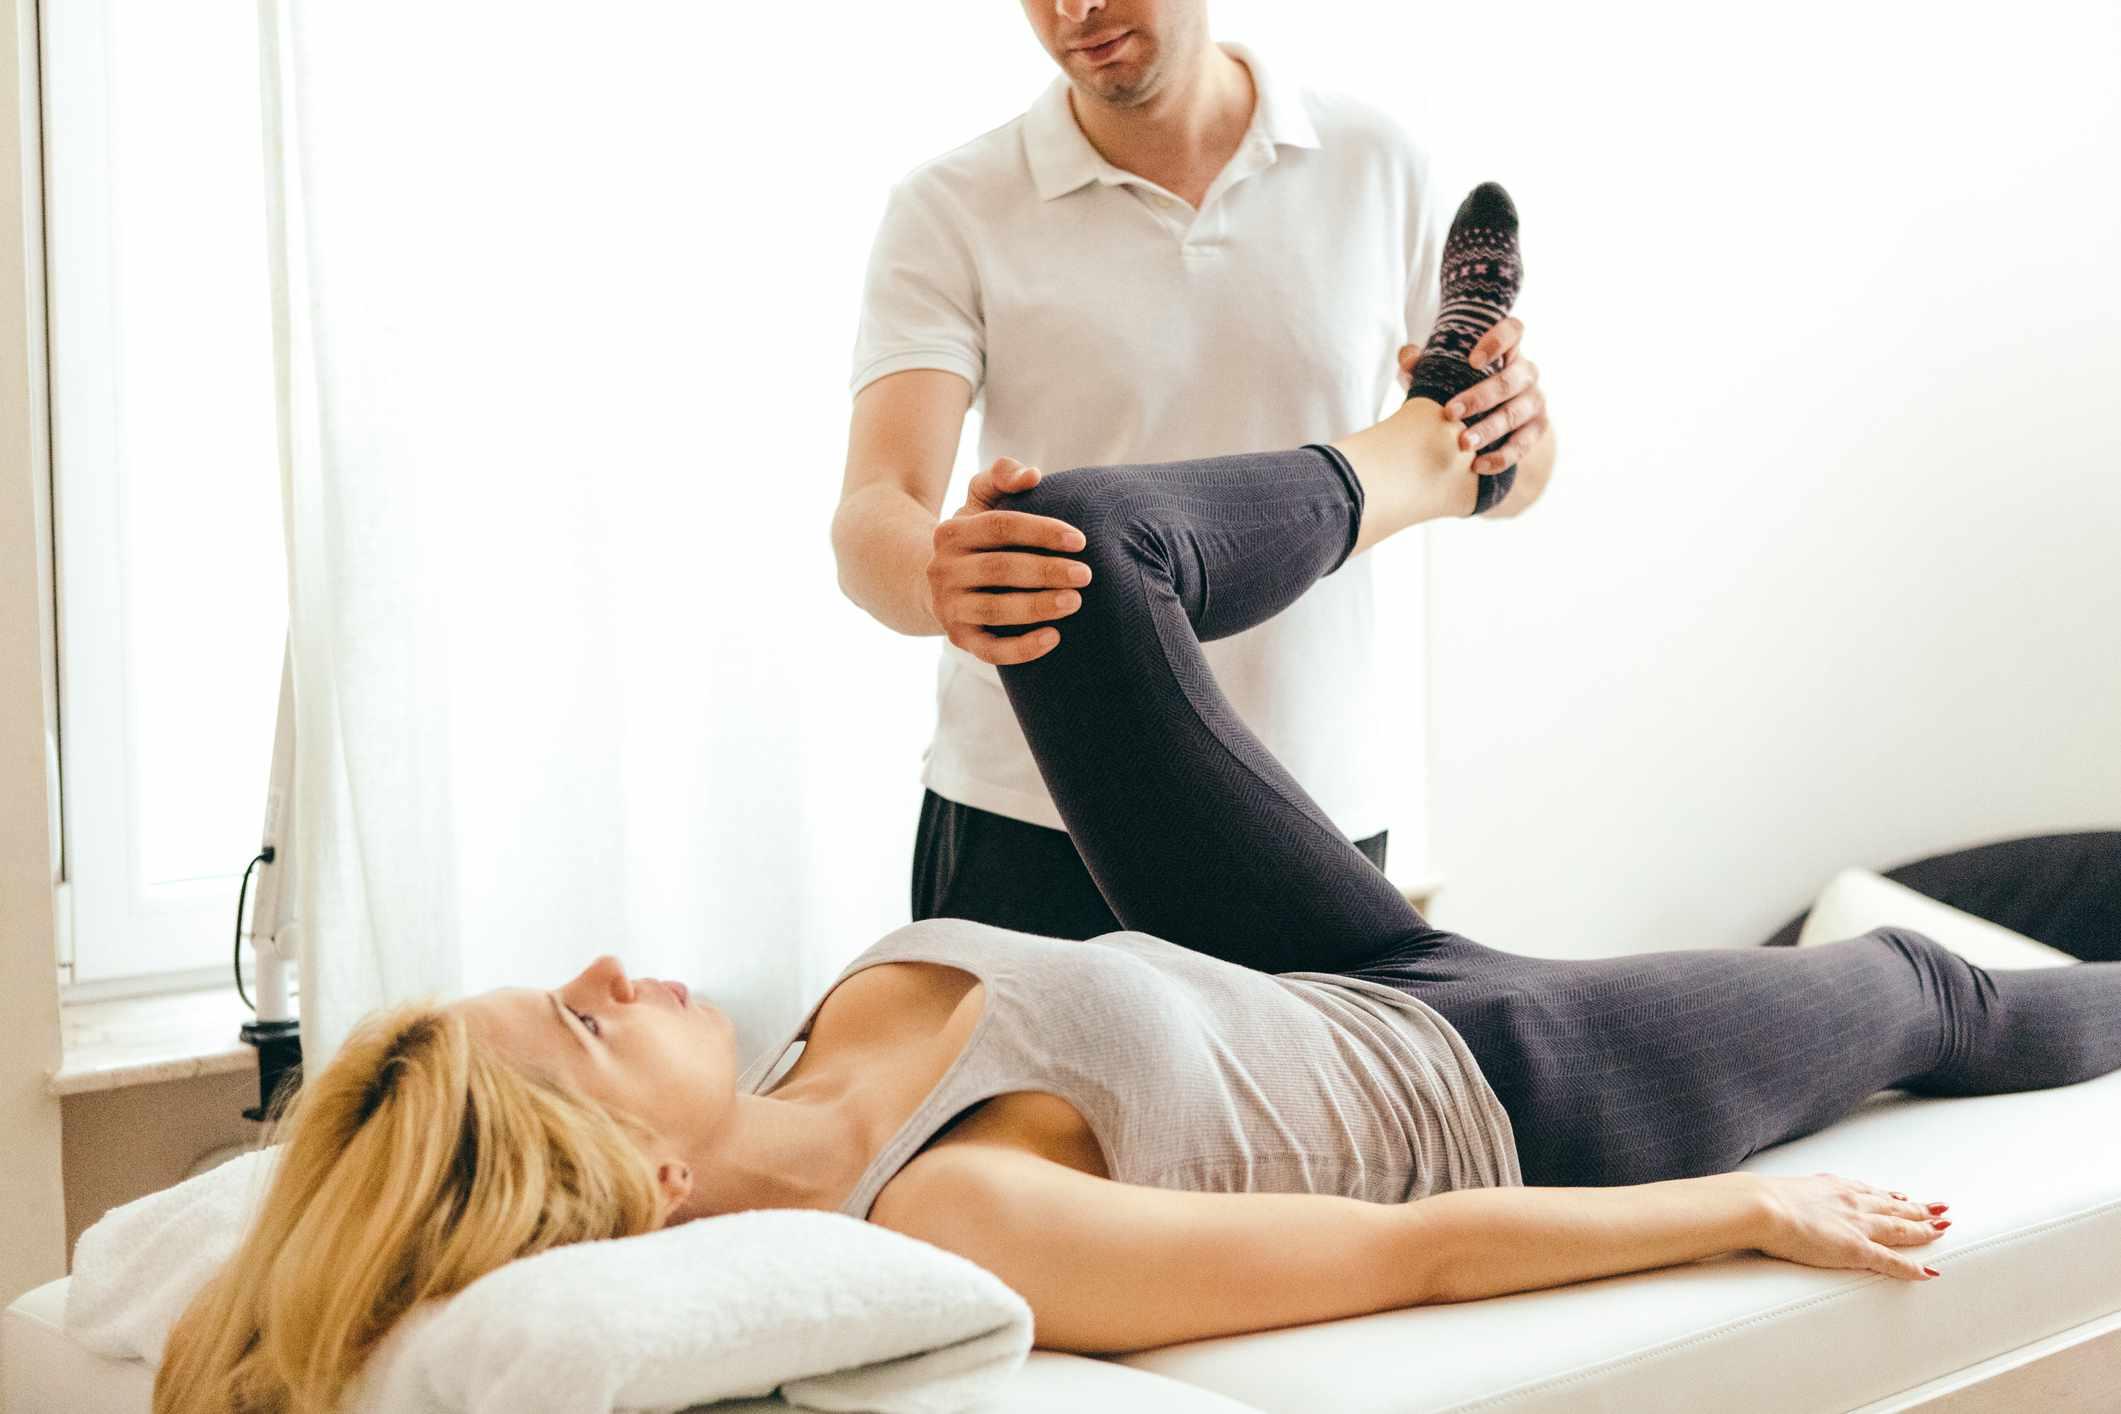 PT examining a woman's knee